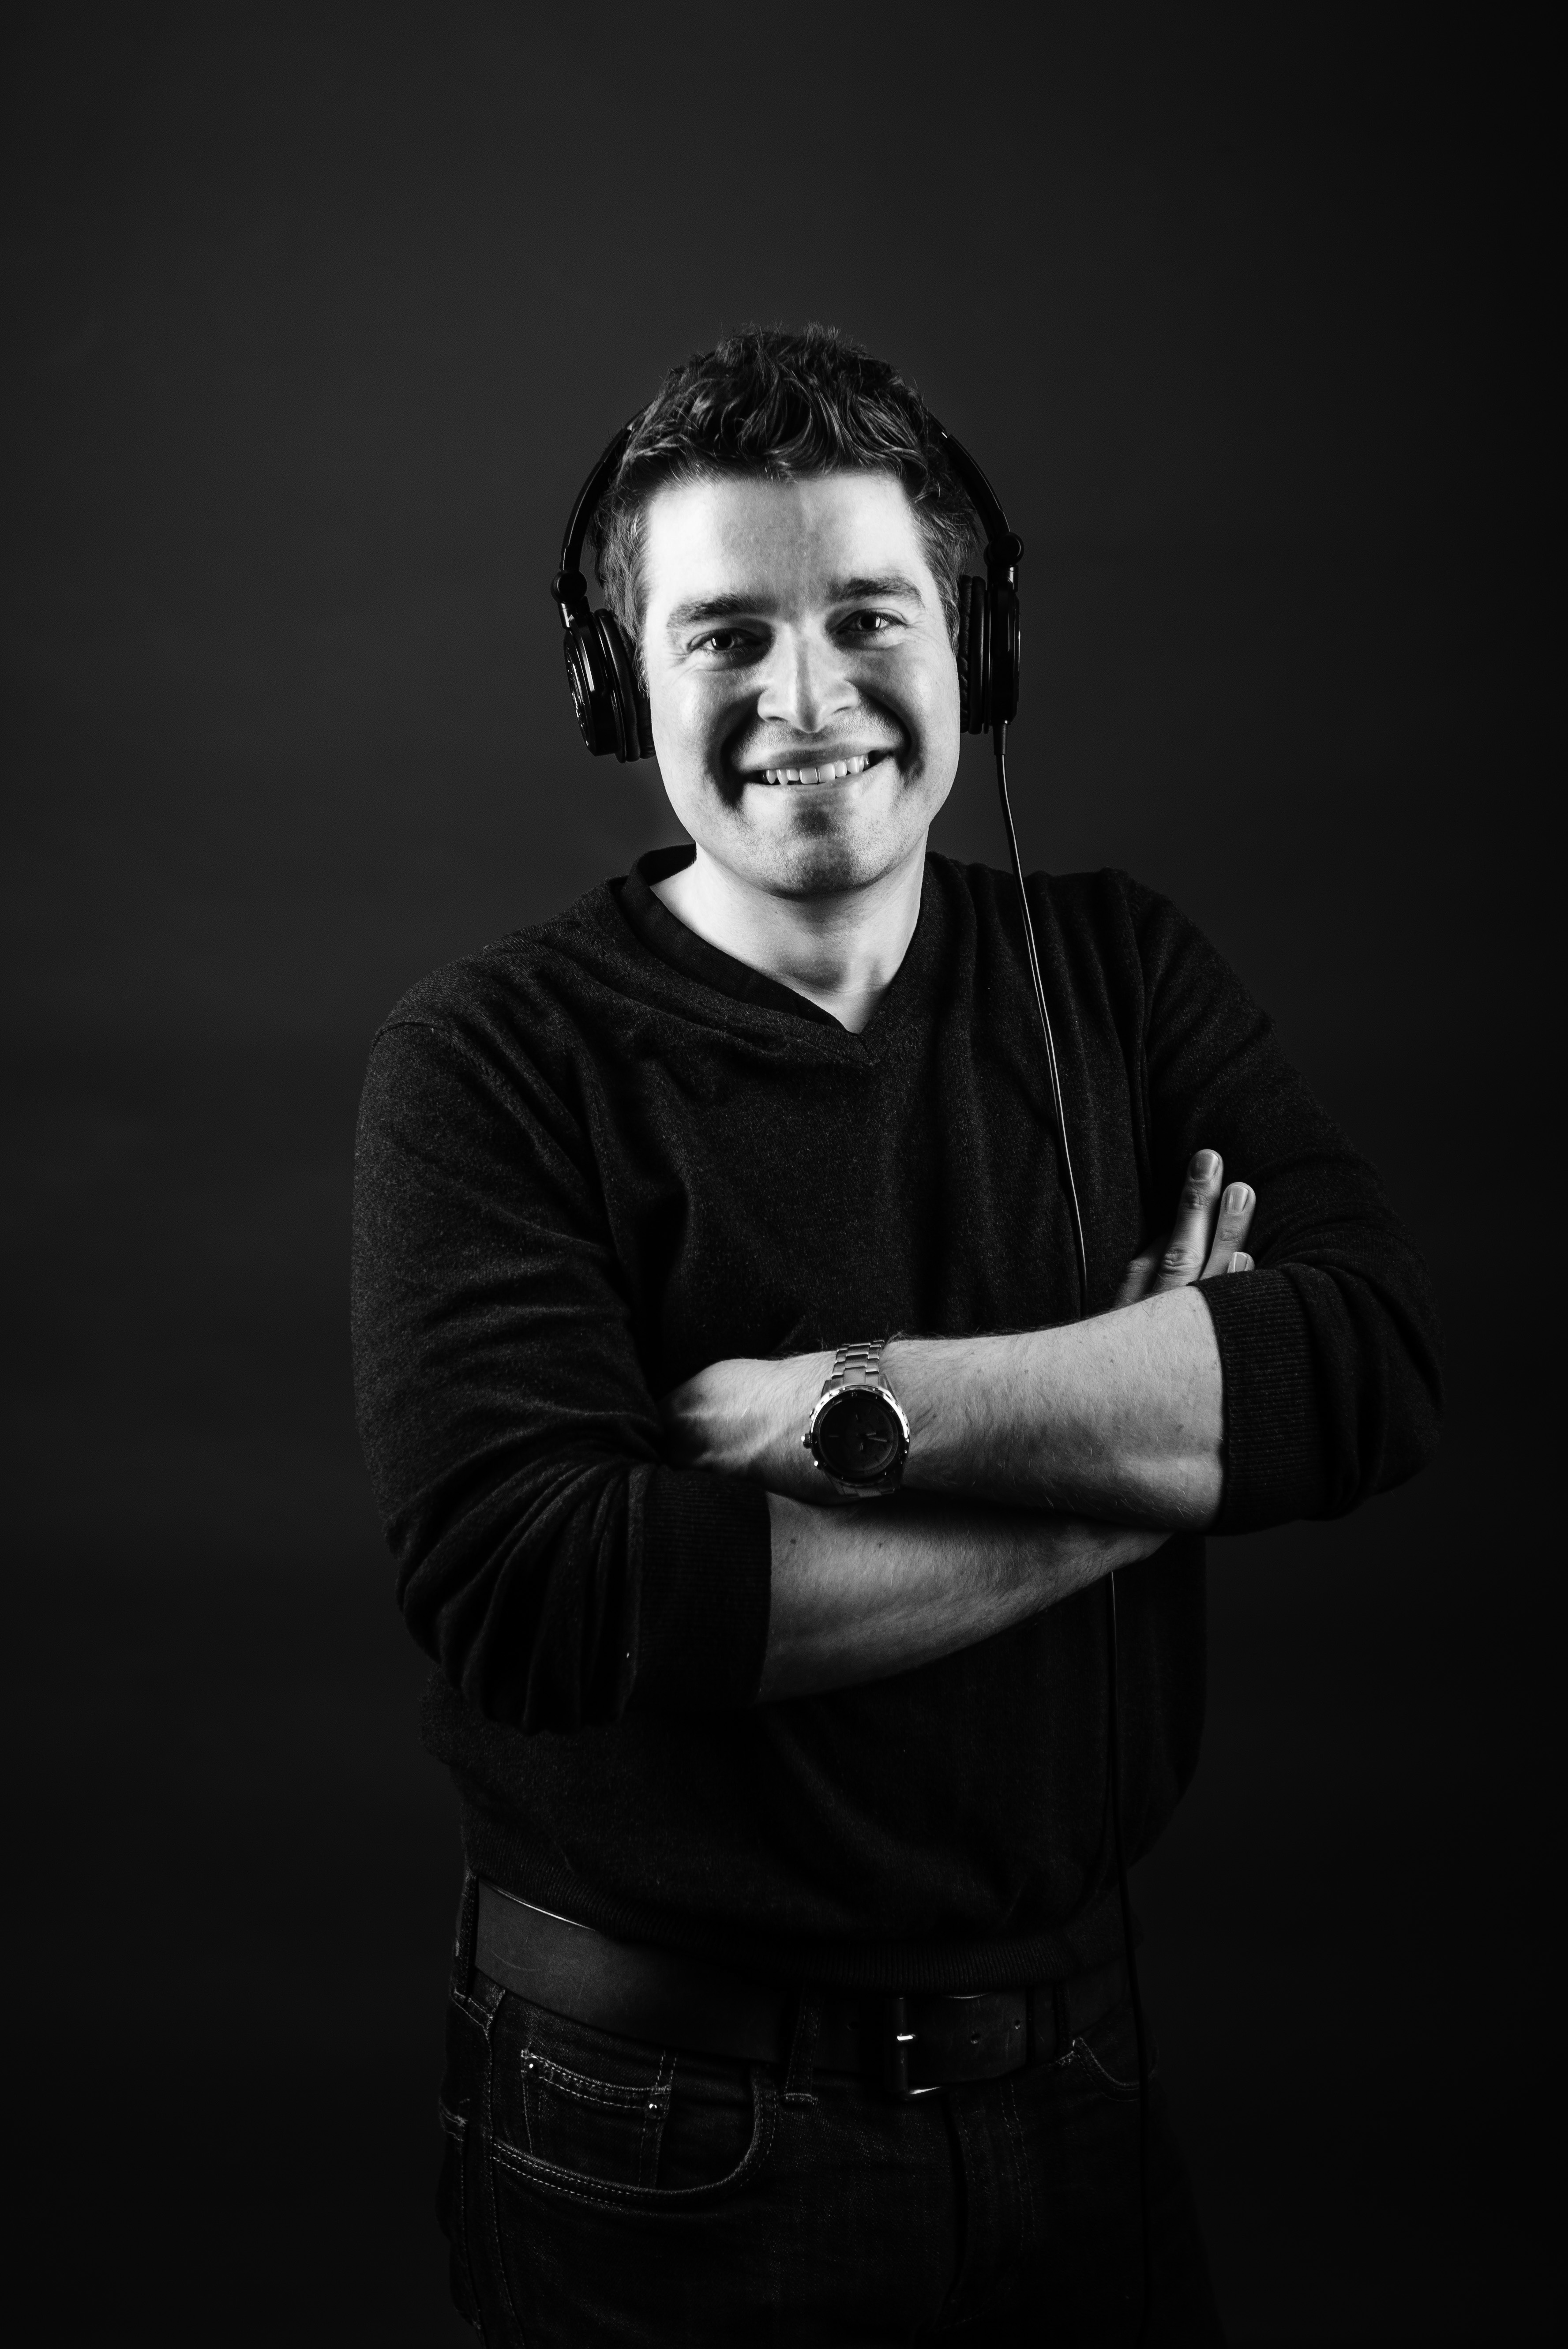 Portrait_Dominik_Höhl_dj_audioplayer_sw